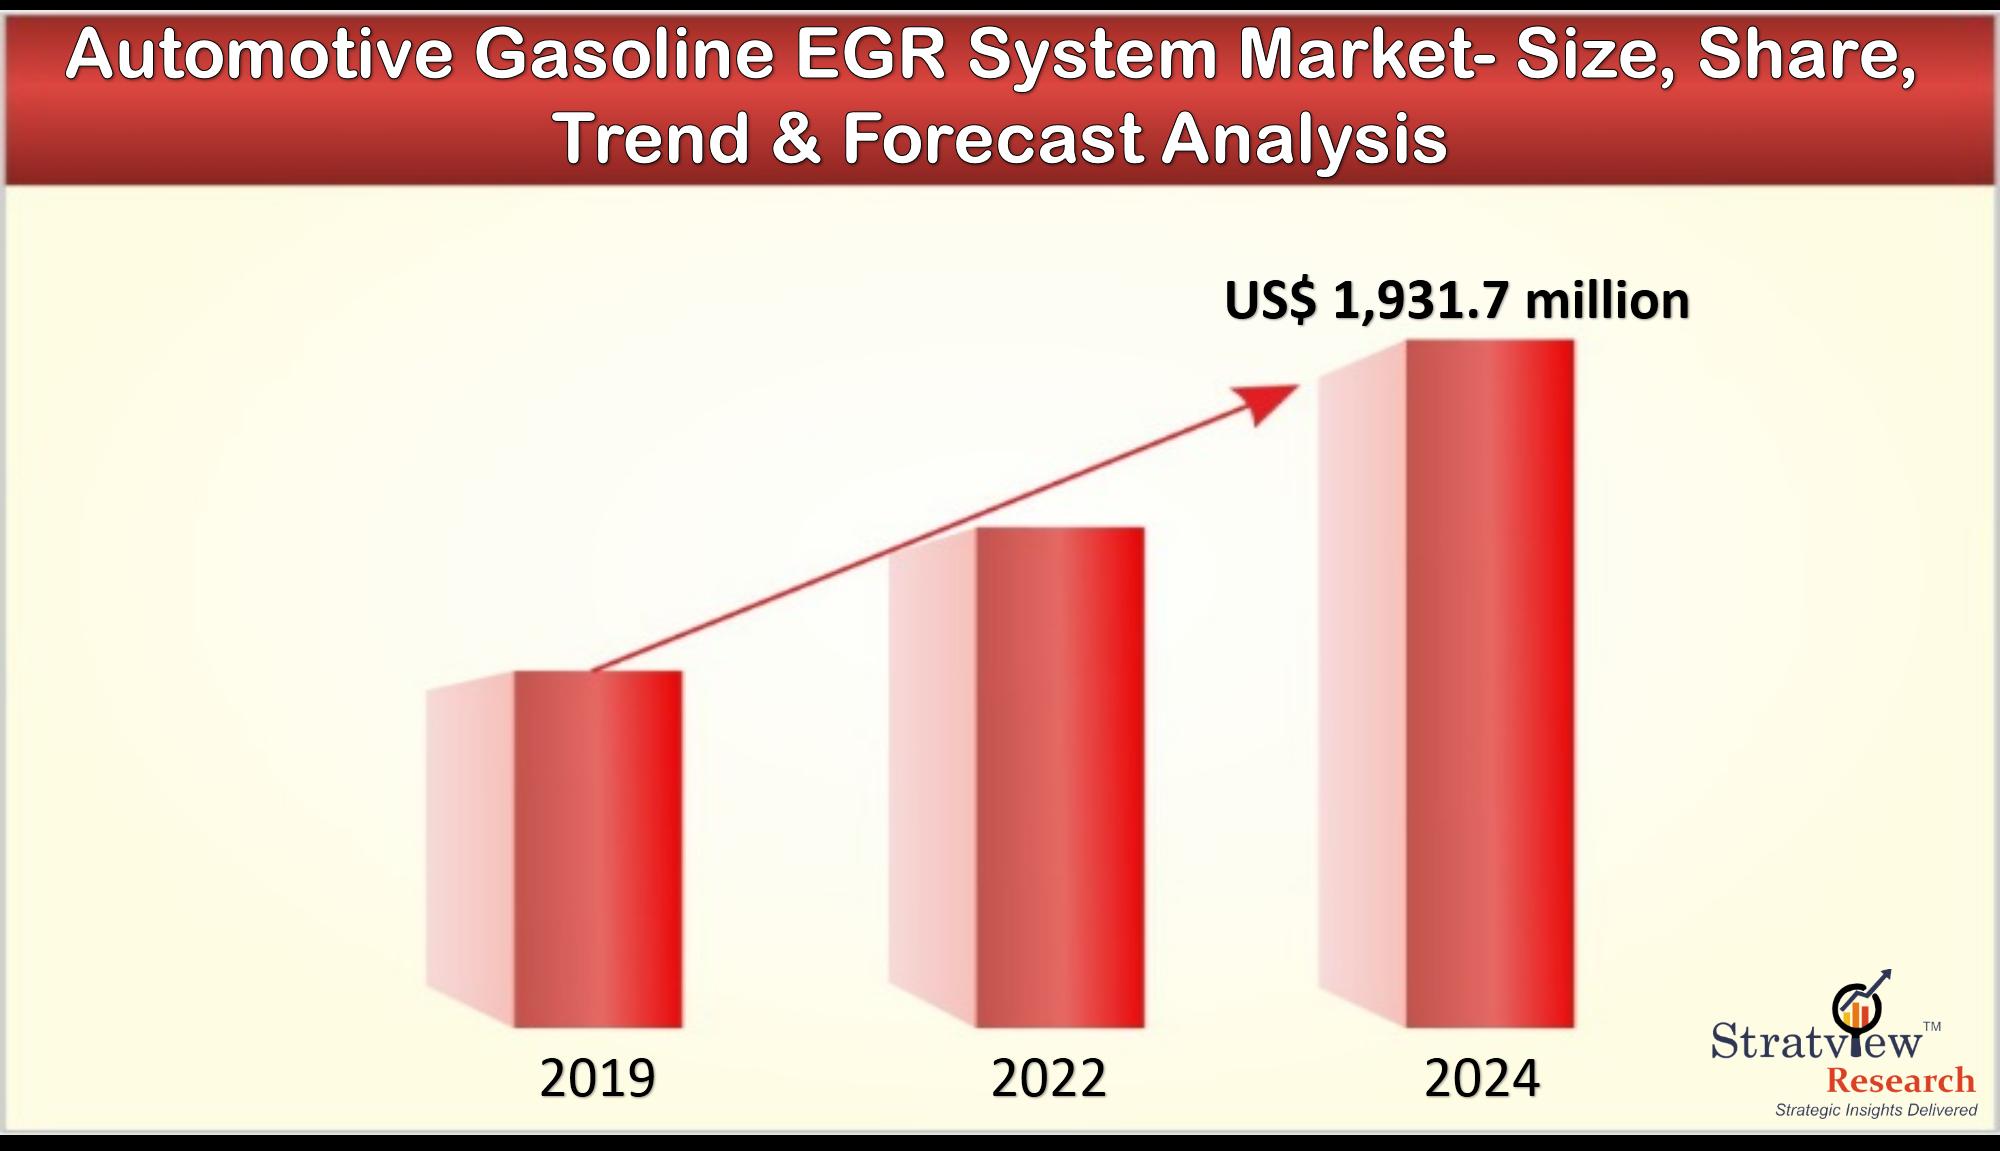 Automotive Gasoline EGR System Market set to US$ 1,931.7 million by 2024